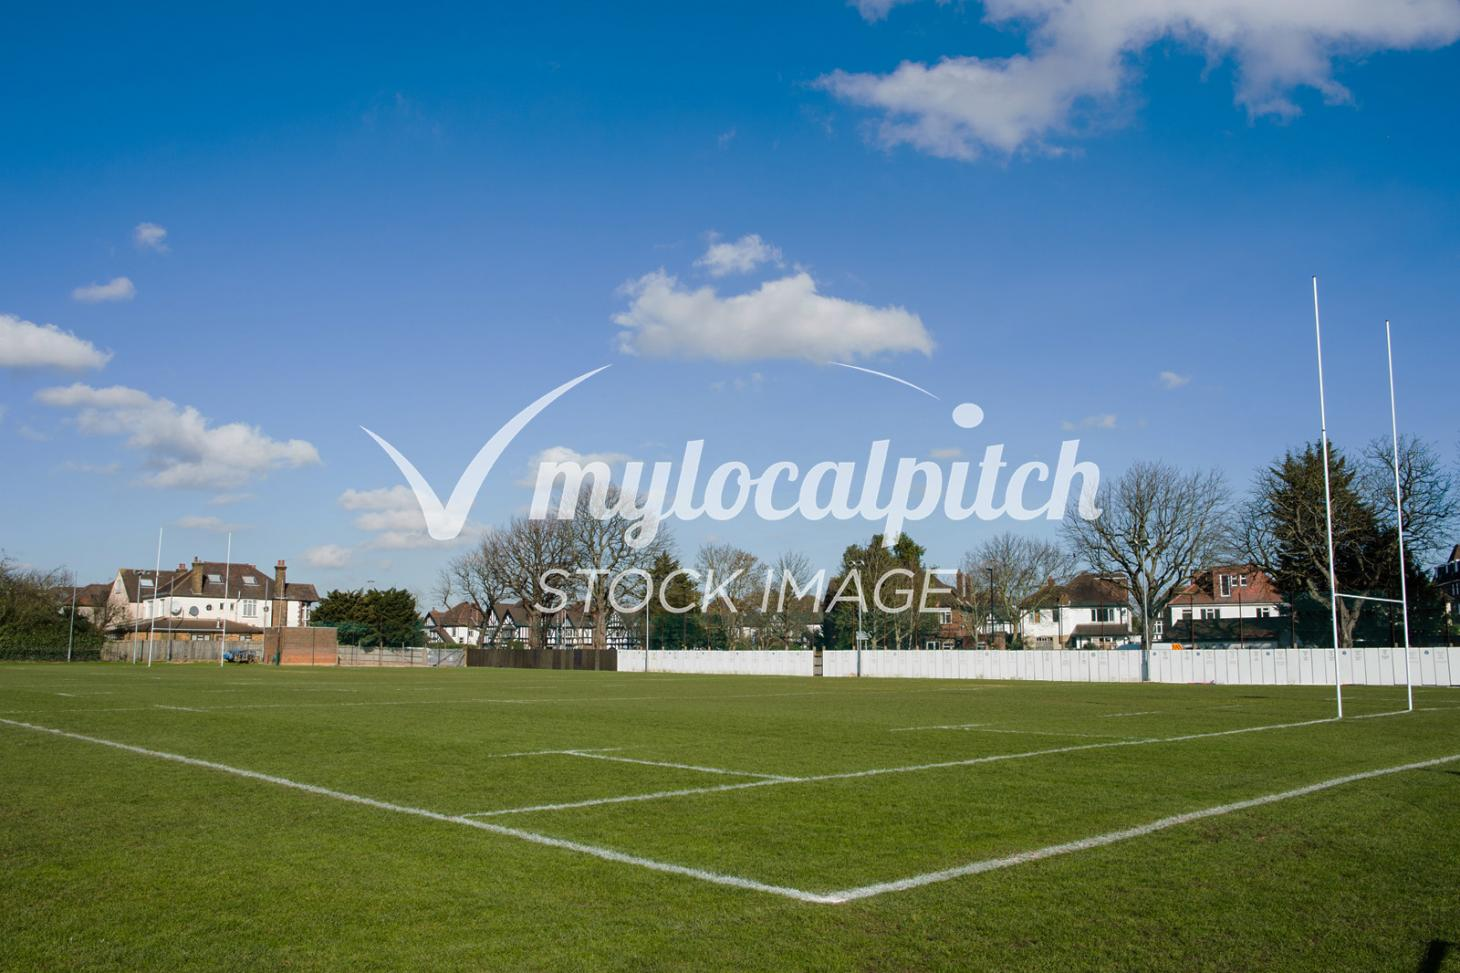 Beths Grammar School Union | Grass rugby pitch